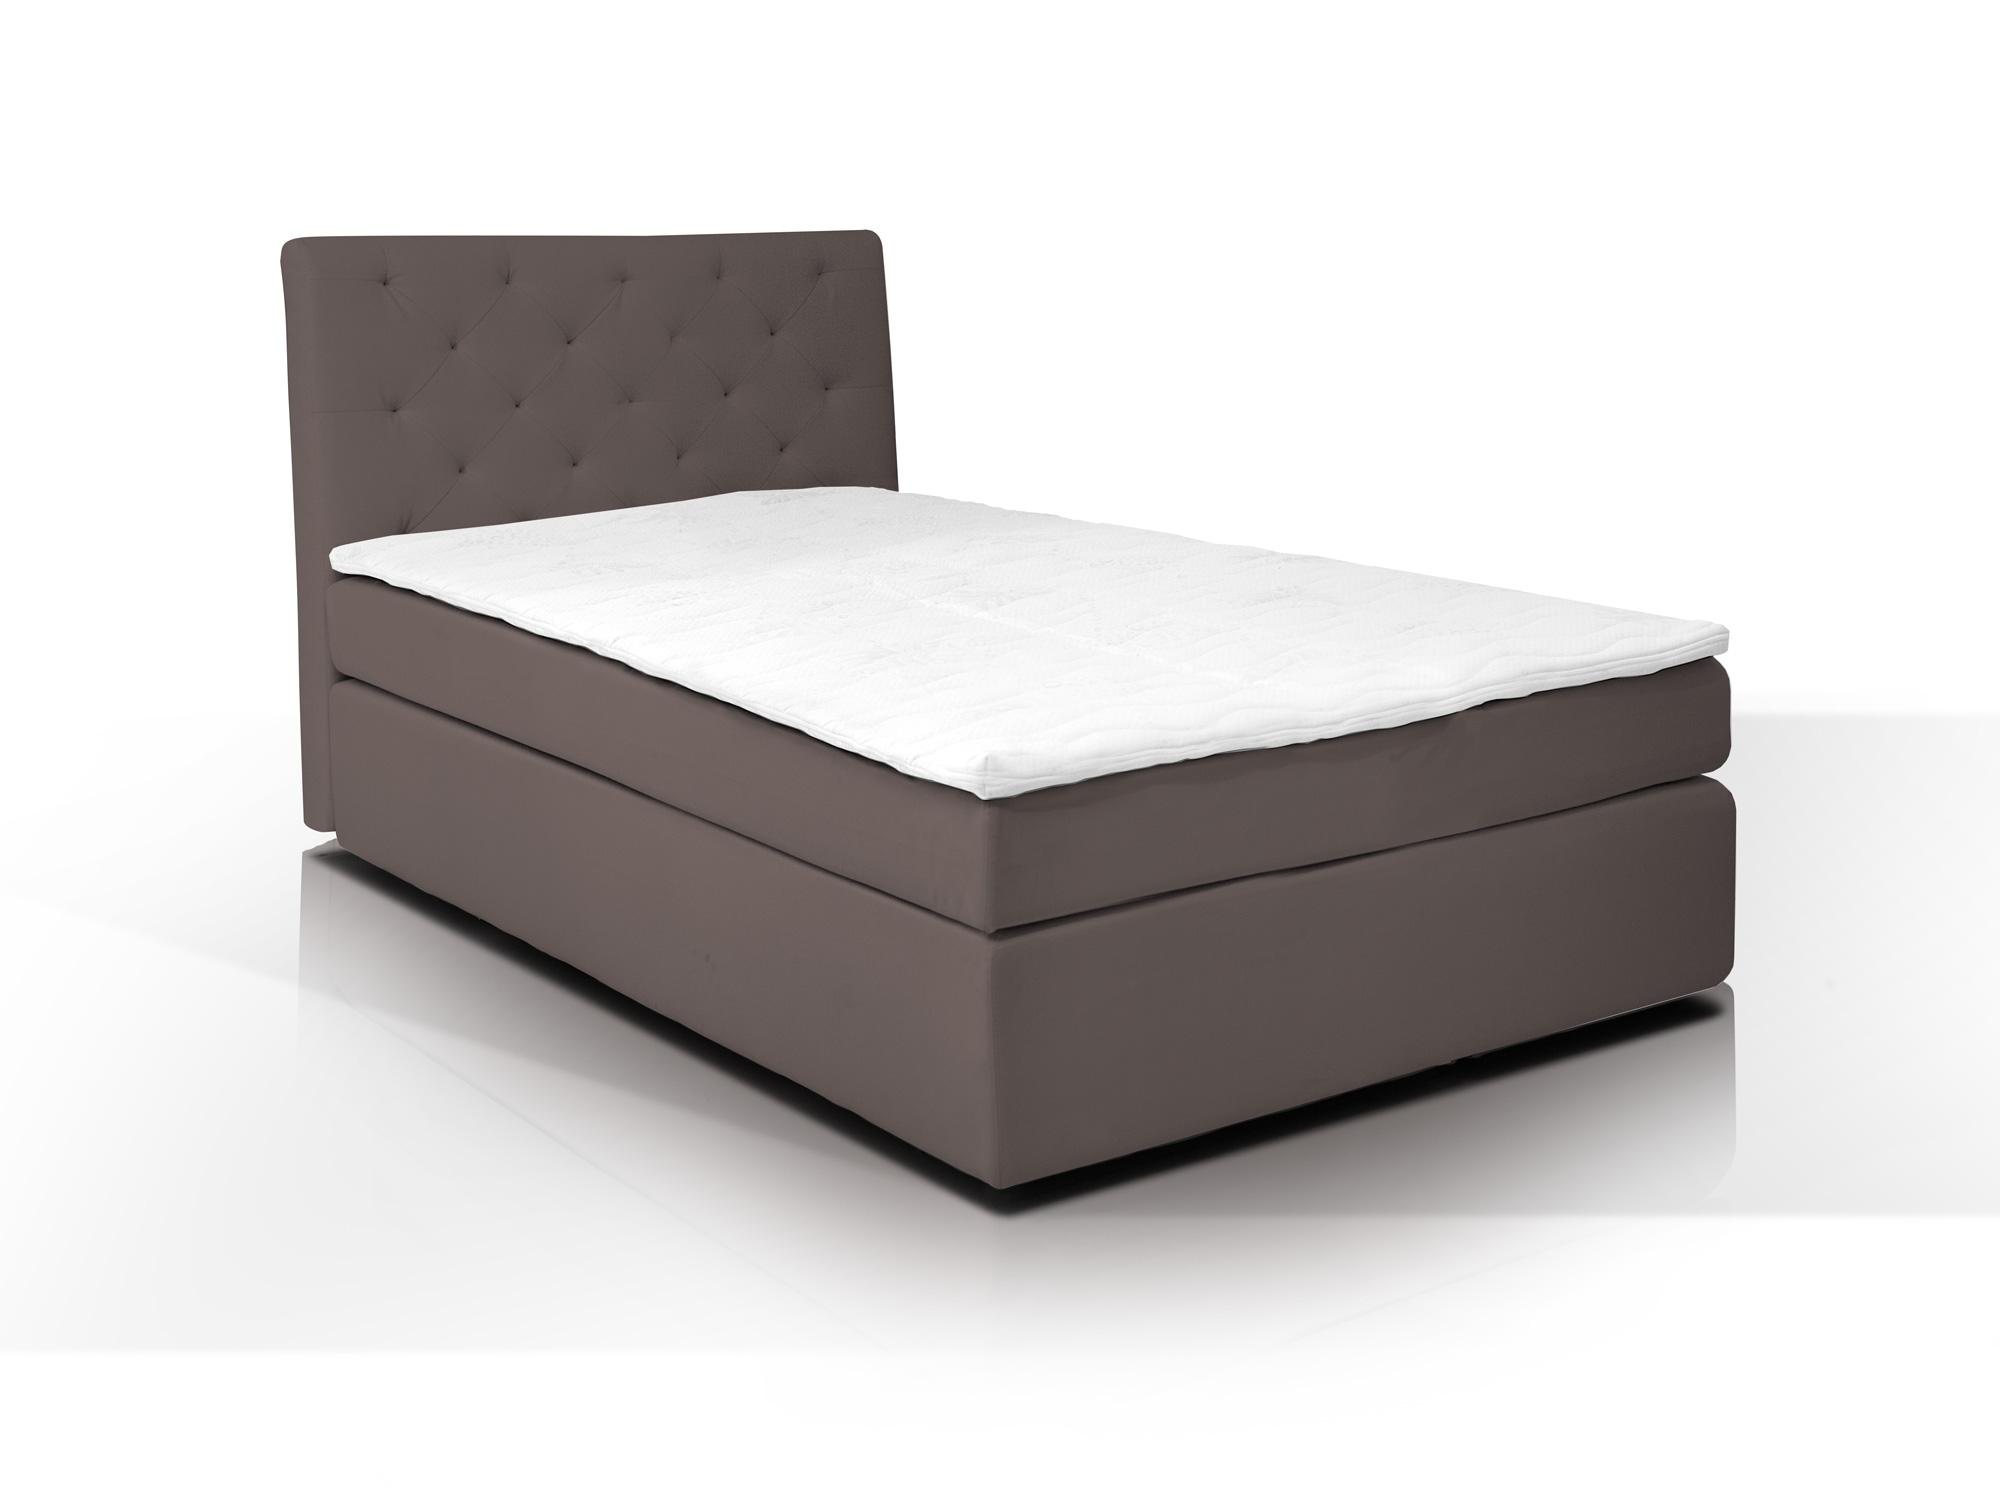 hotel boxspringbett webstoffbezug 80 x 200 cm braun. Black Bedroom Furniture Sets. Home Design Ideas